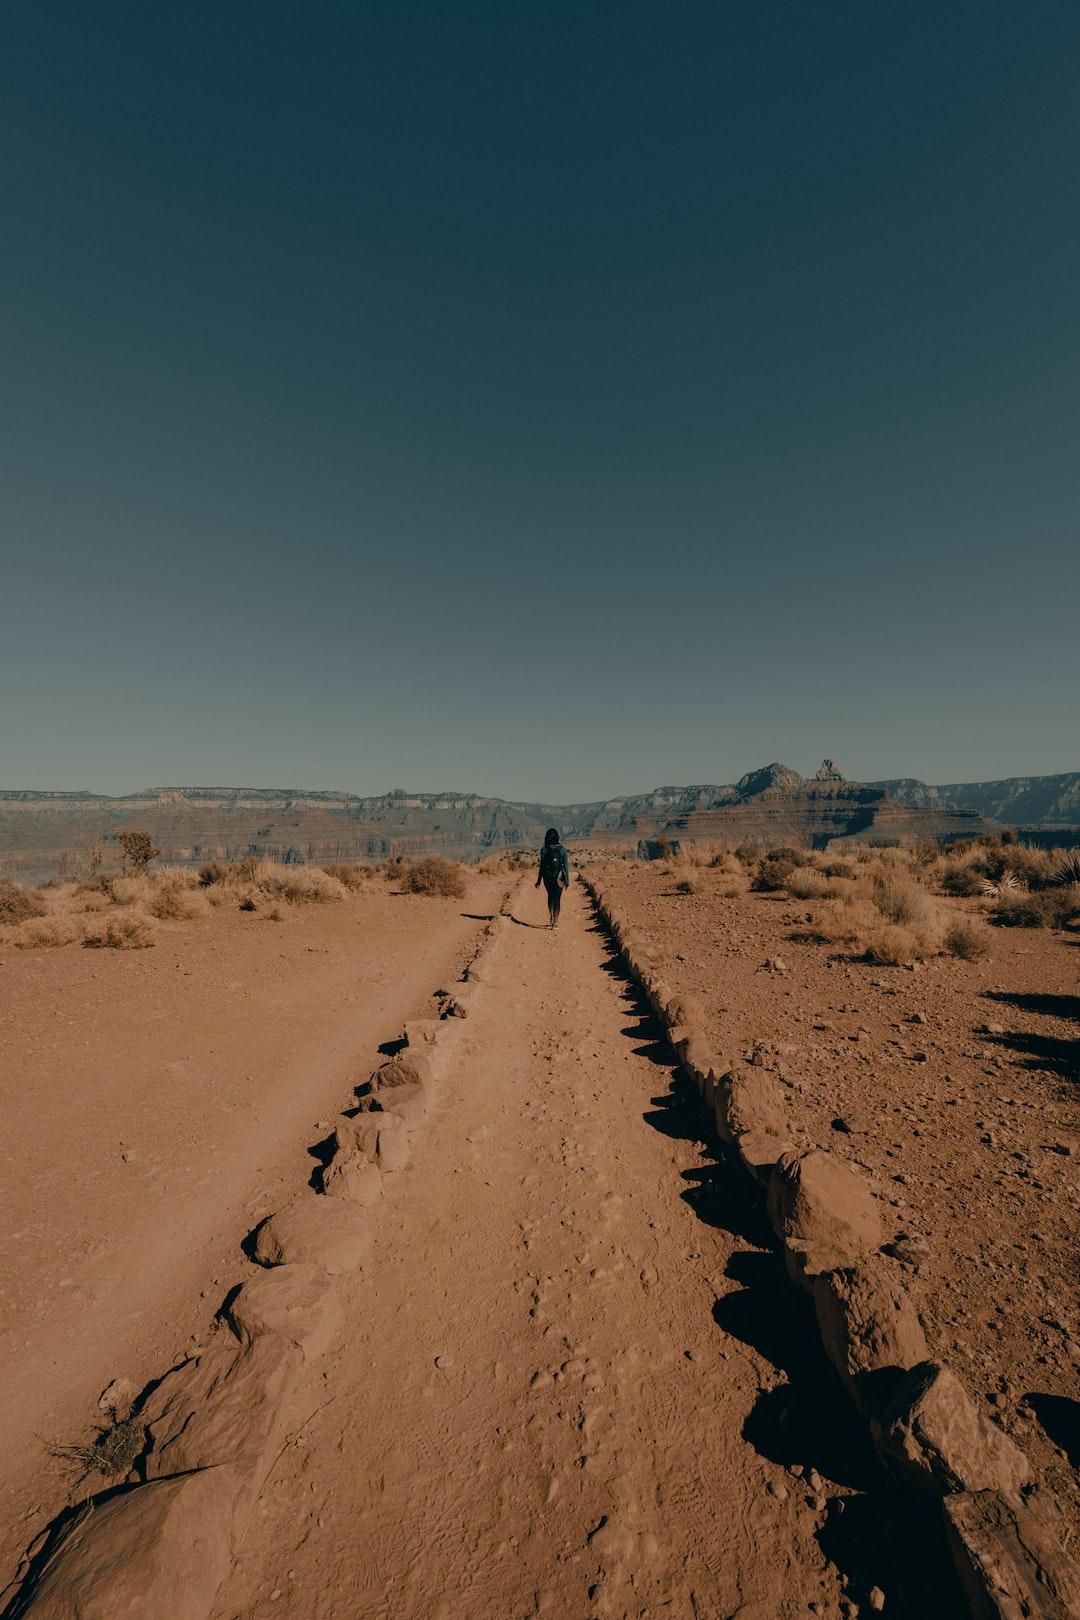 Walking through the canyon [ IG: @clay.banks ]